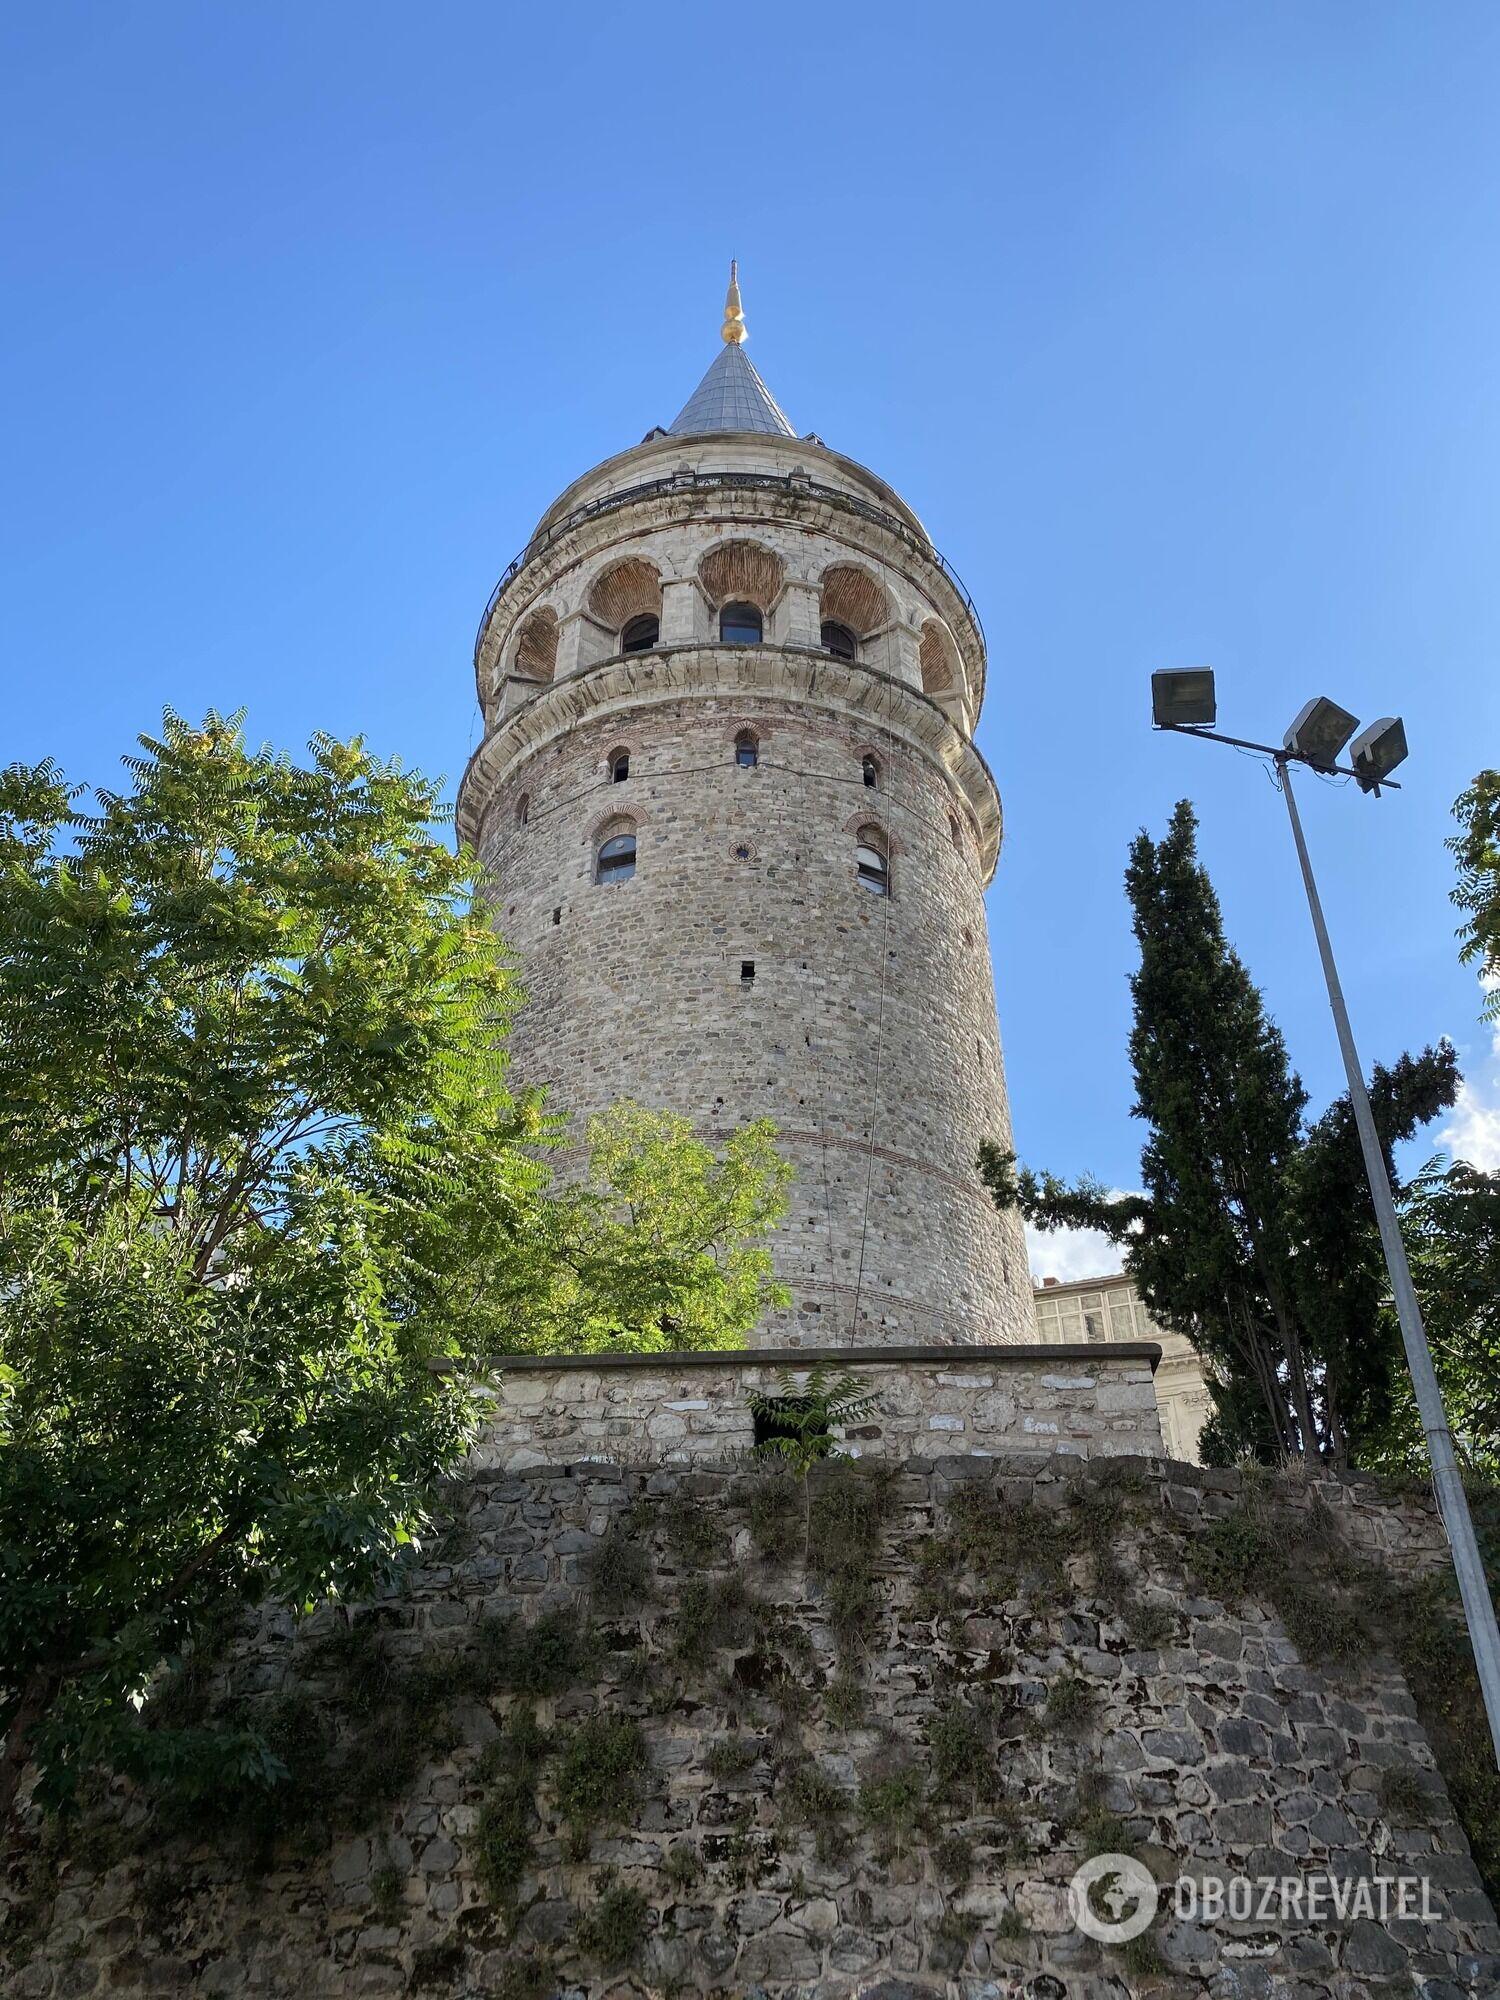 Стамбул – город-легенда. 10 советов путешественнику